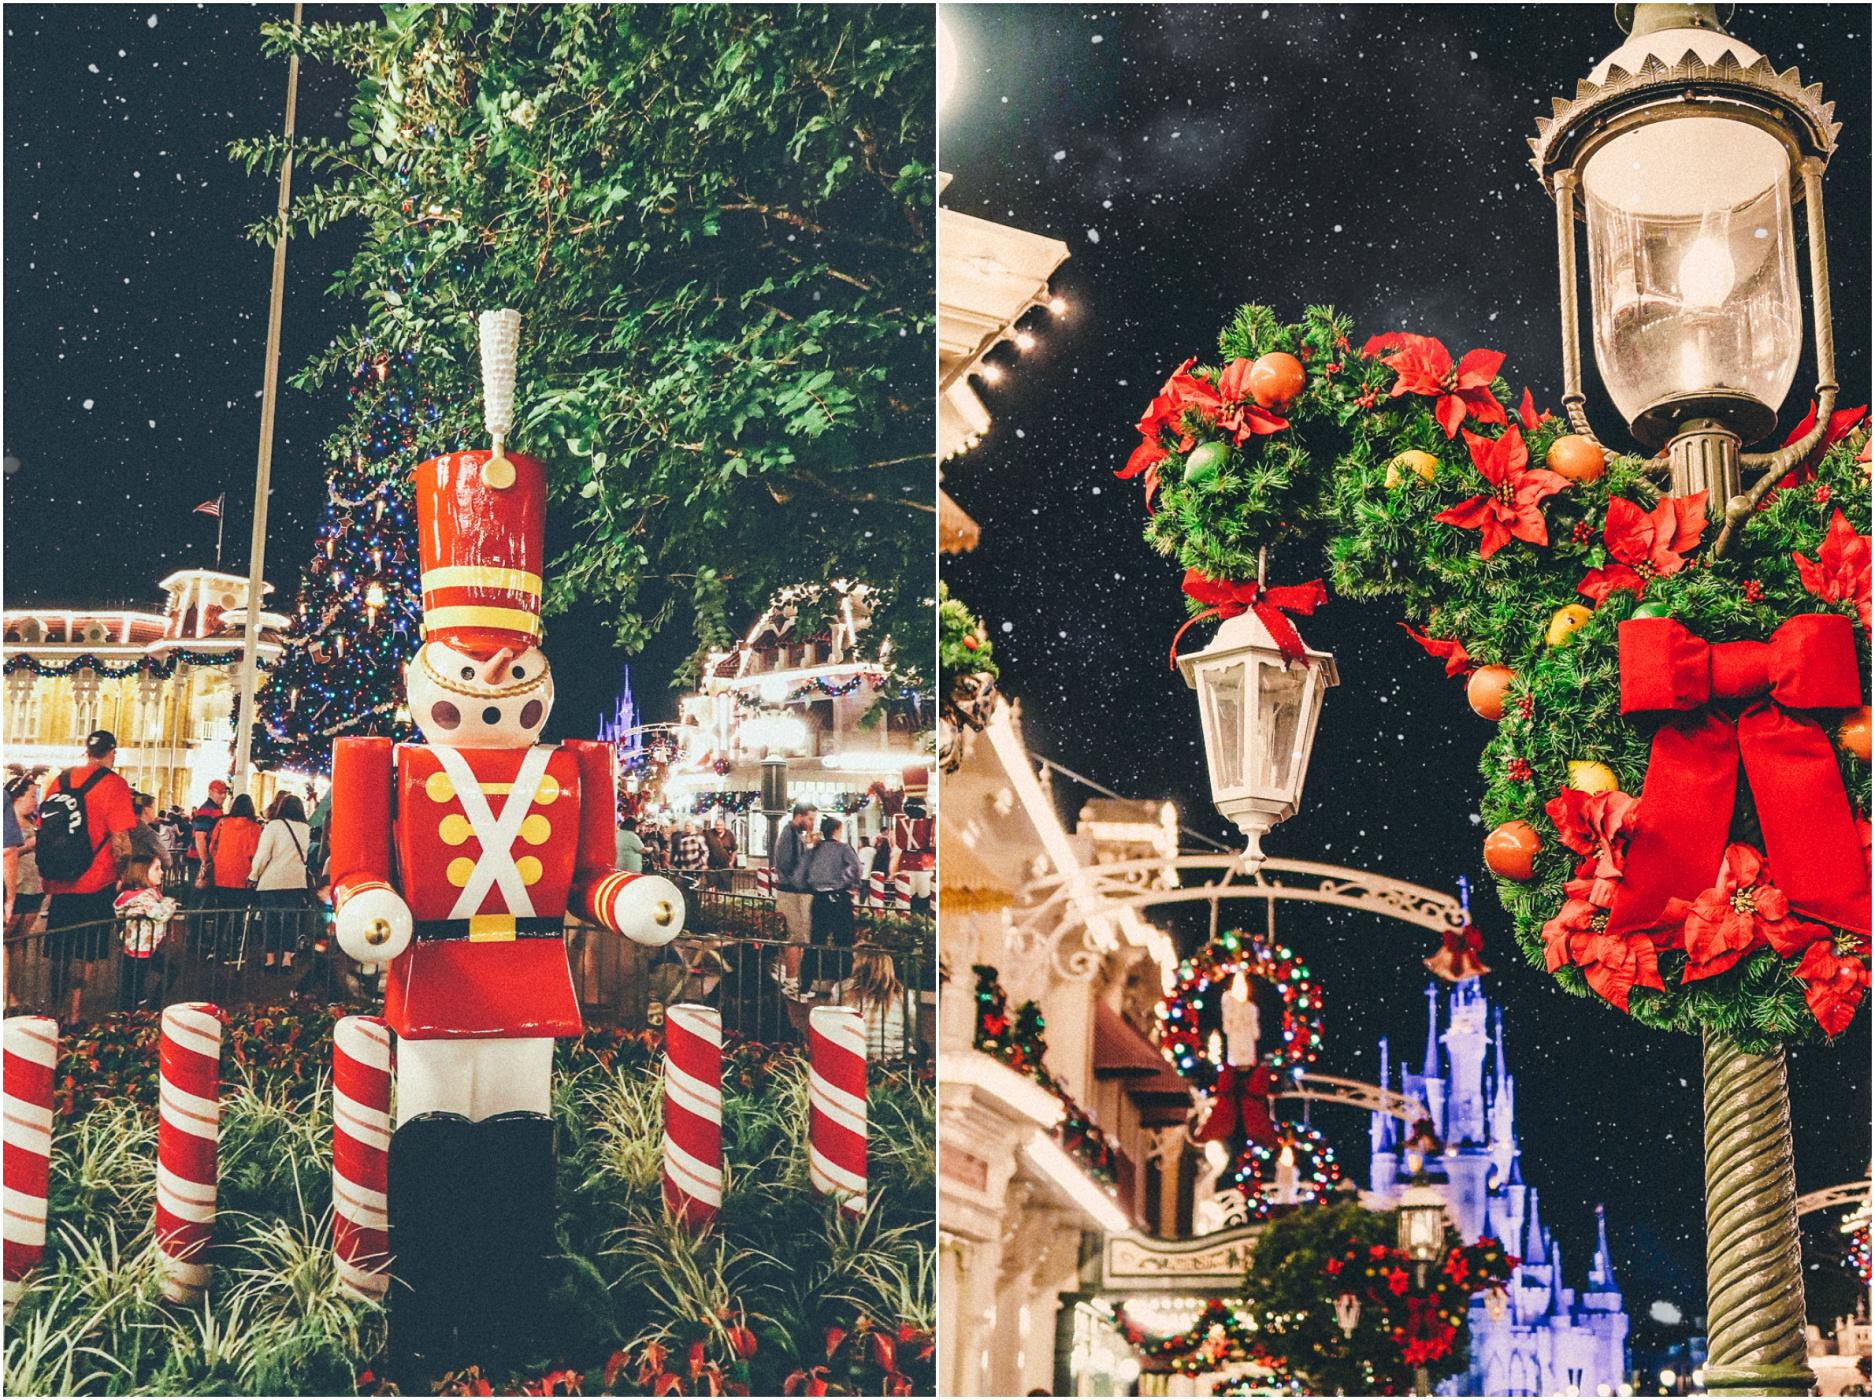 Magic Kingdom Disney World At Night Fireworks Show Christmas